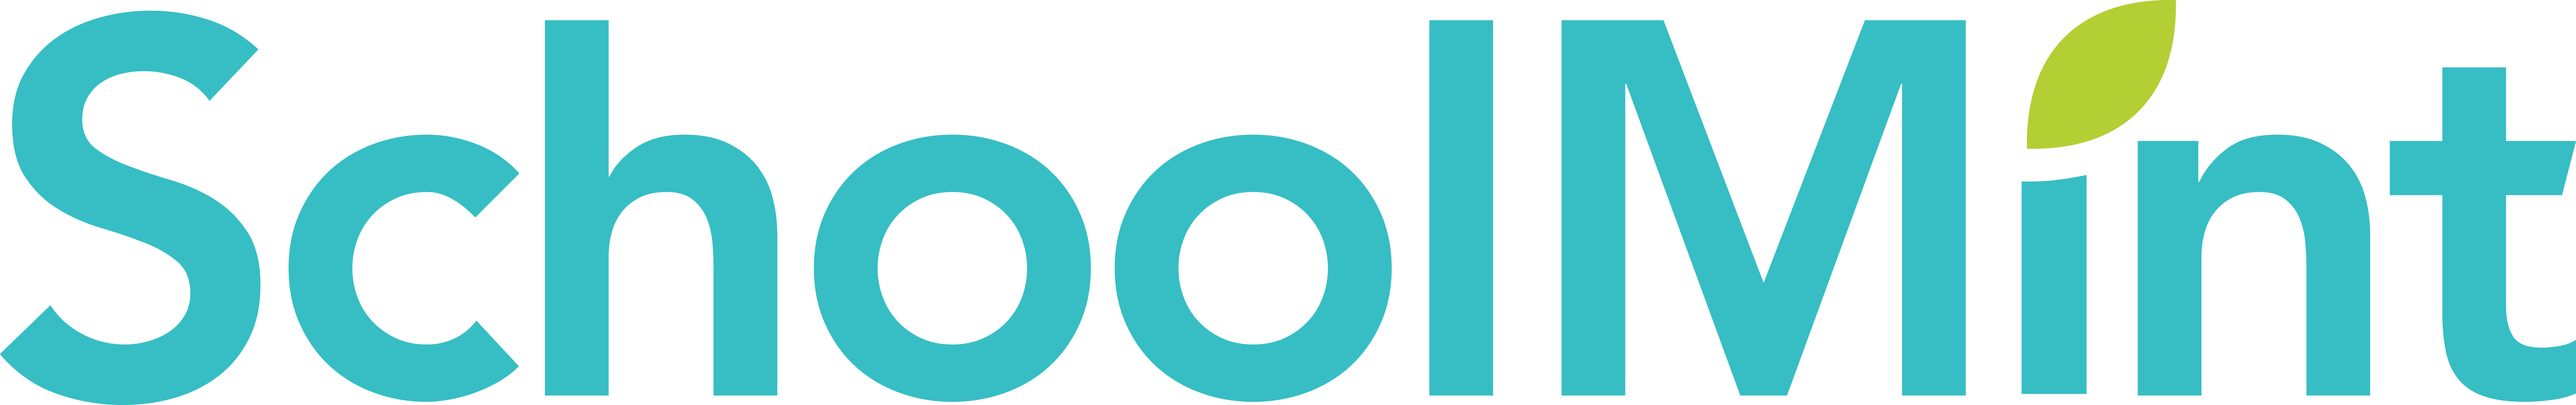 schoolmint-logo